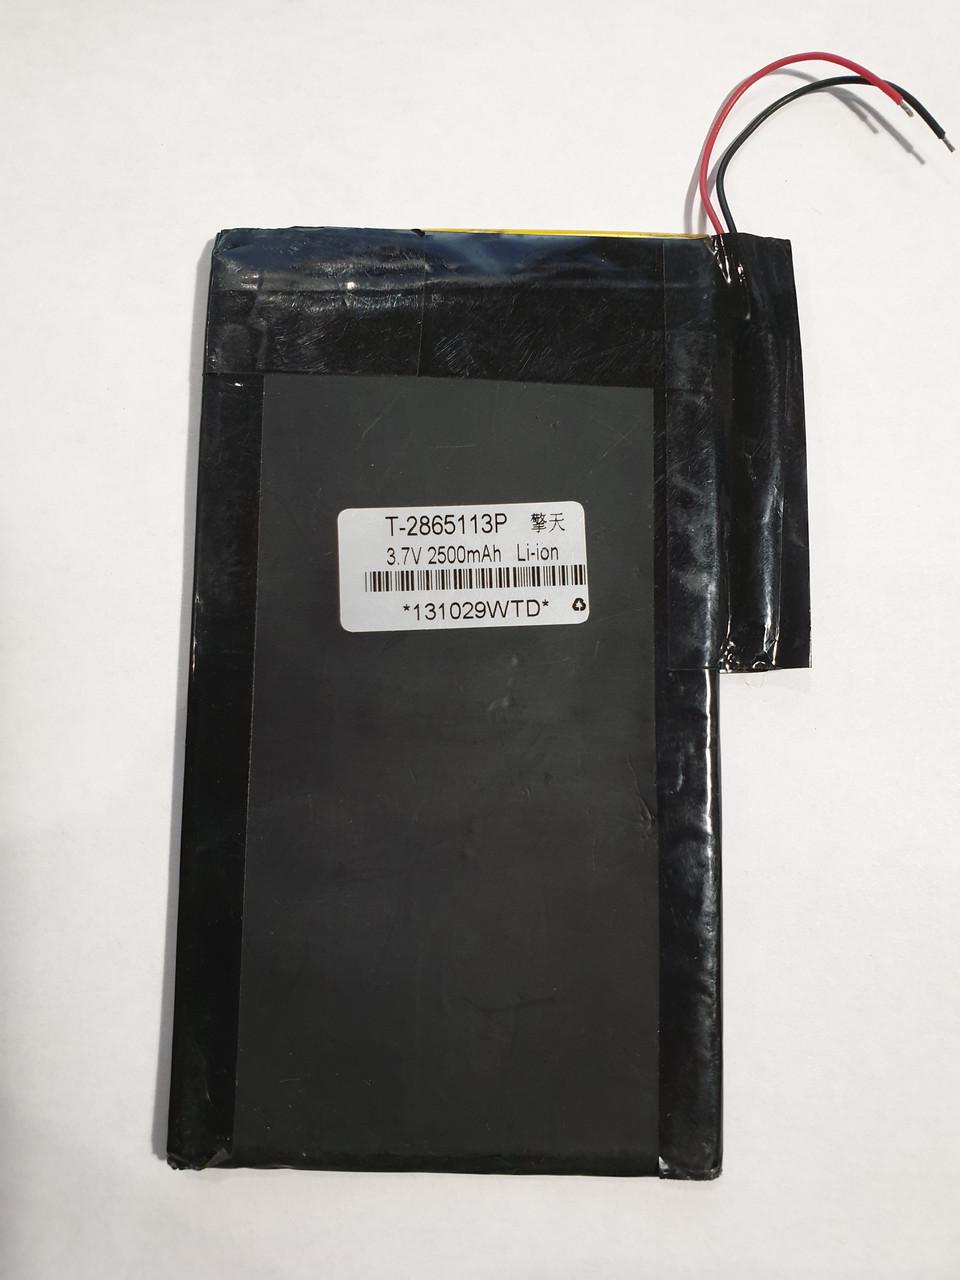 Аккумулятop 3,7v 2500mAh T-286511P (A1376) 3x63x114mm  для iPad 2